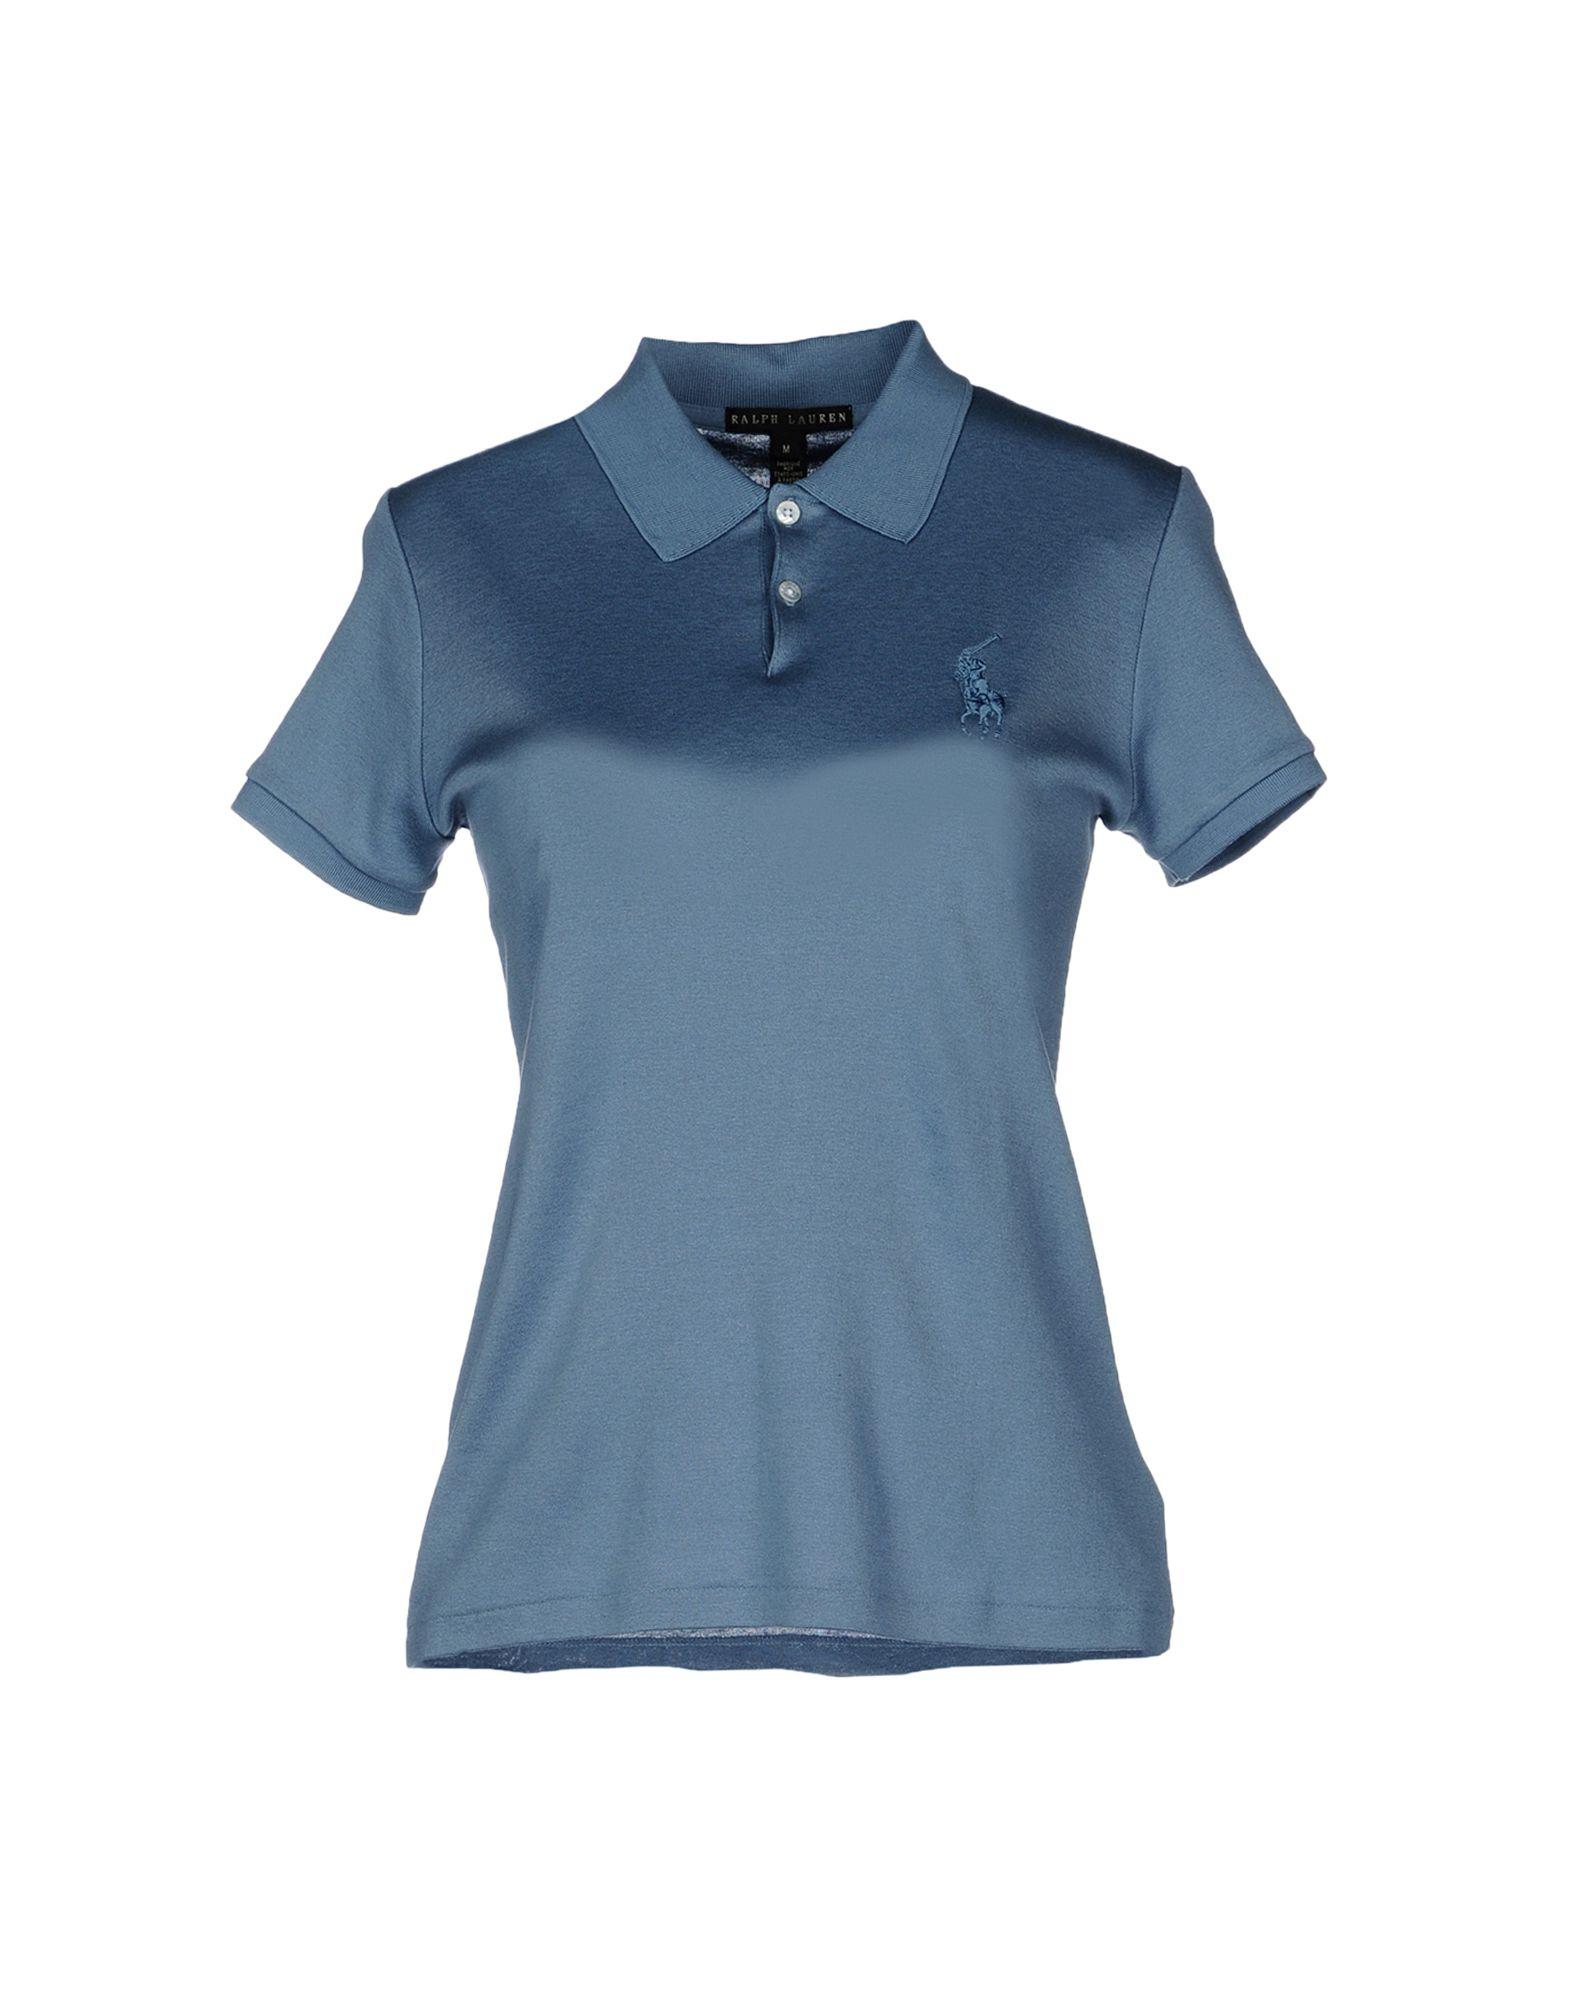 Ralph lauren black label polo shirt in blue pastel blue for Ralph lauren black label polo shirt